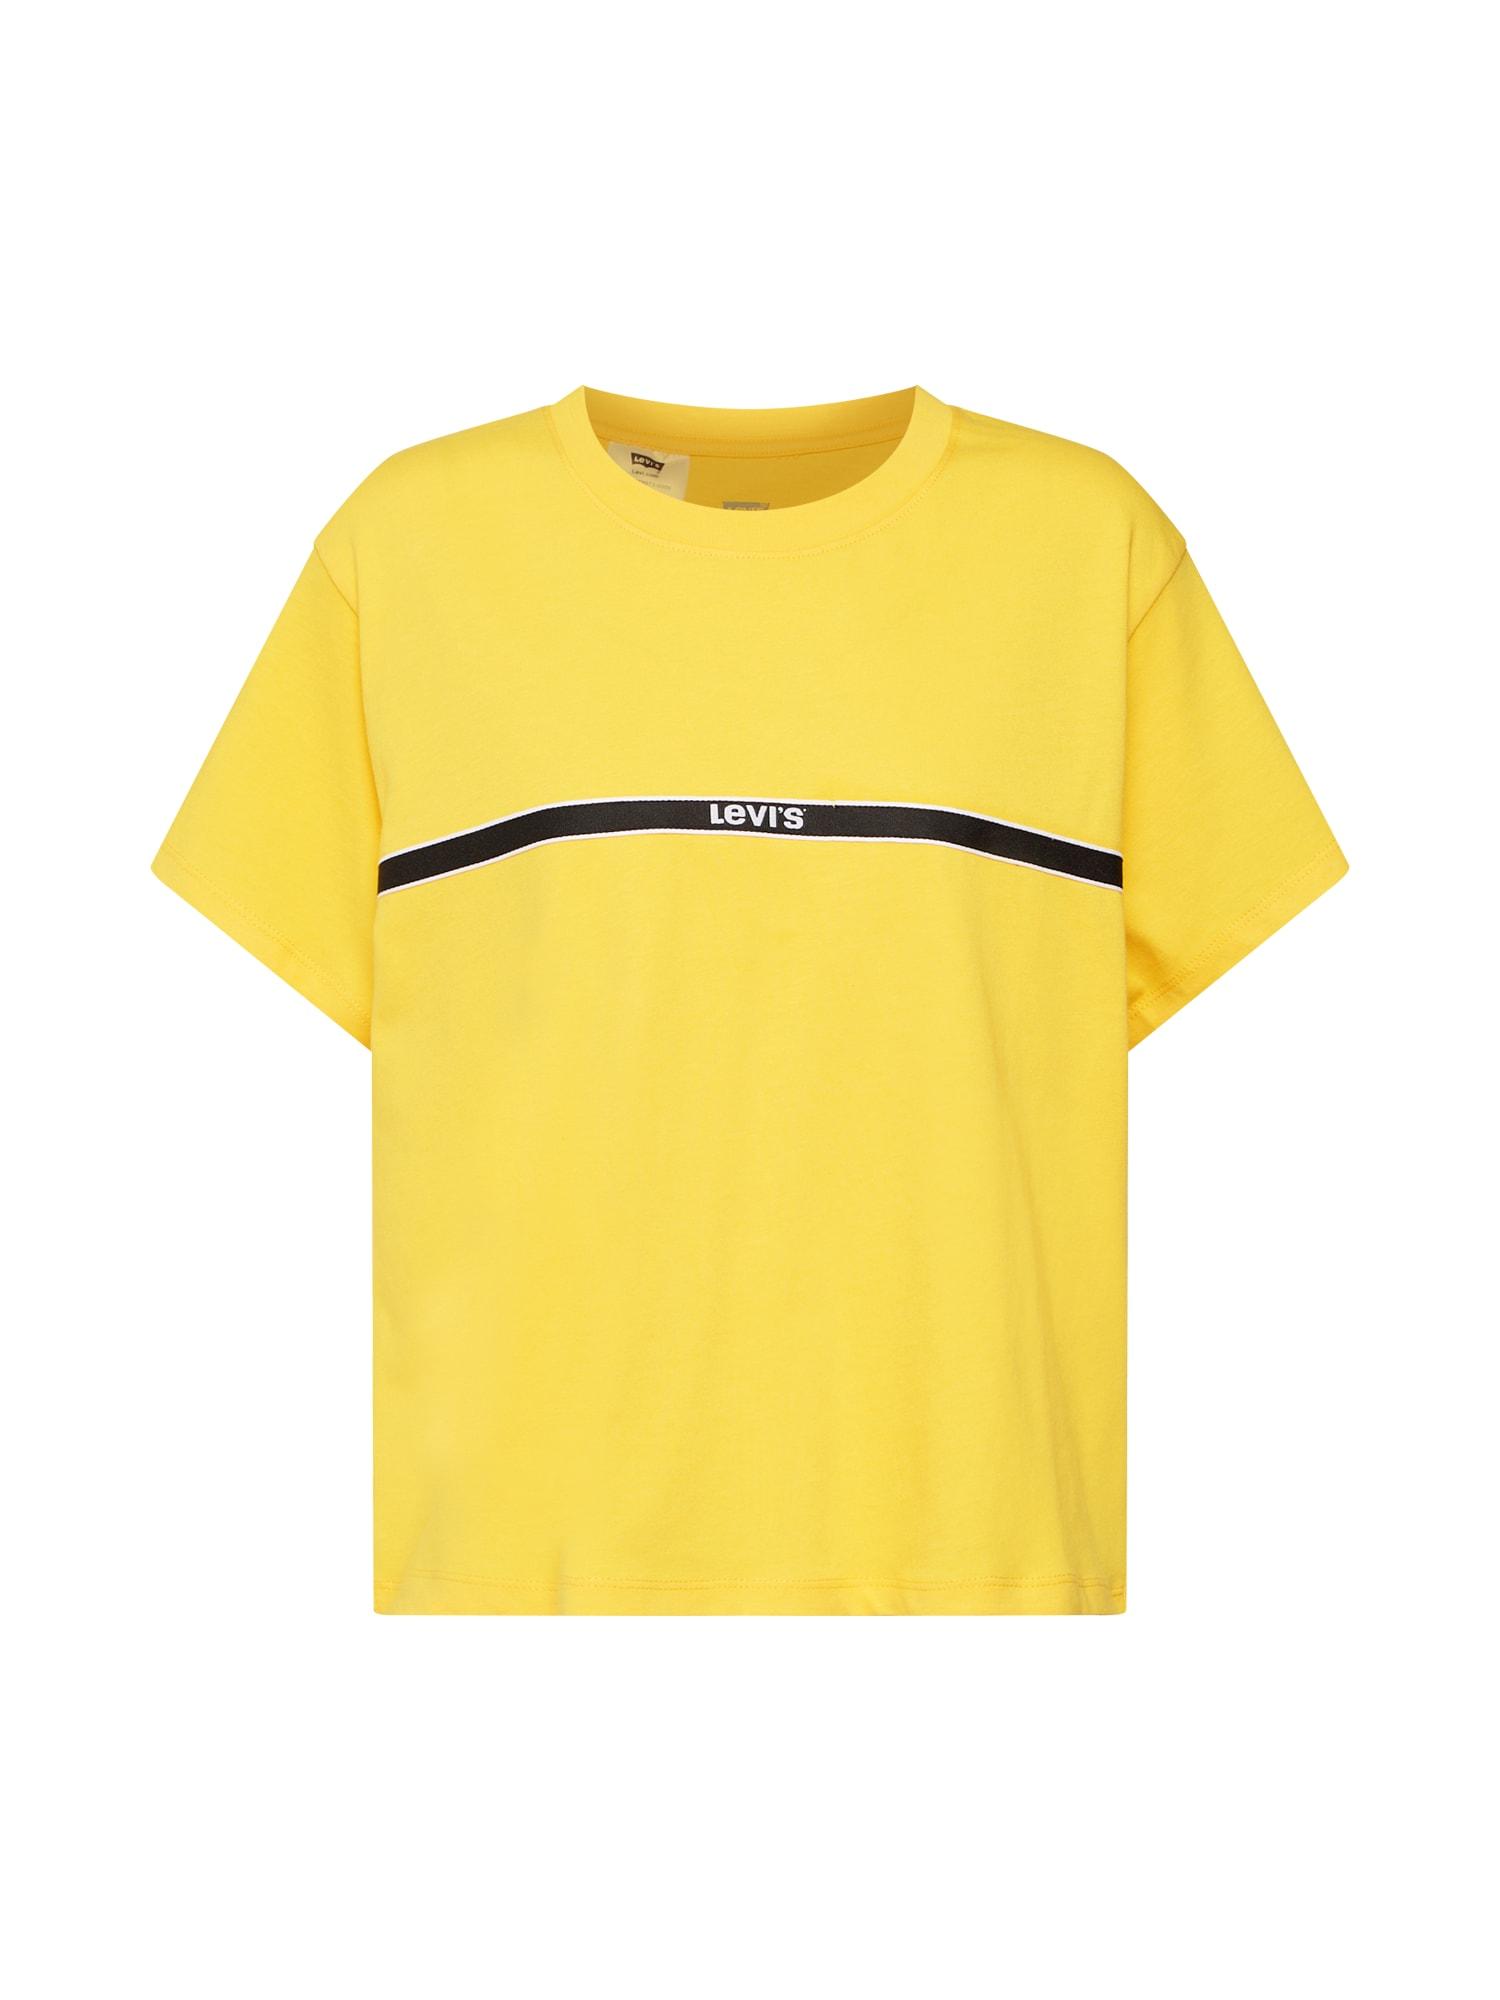 LEVIS Tričko GRAPHIC VARSITY TEE žlutá černá LEVI'S